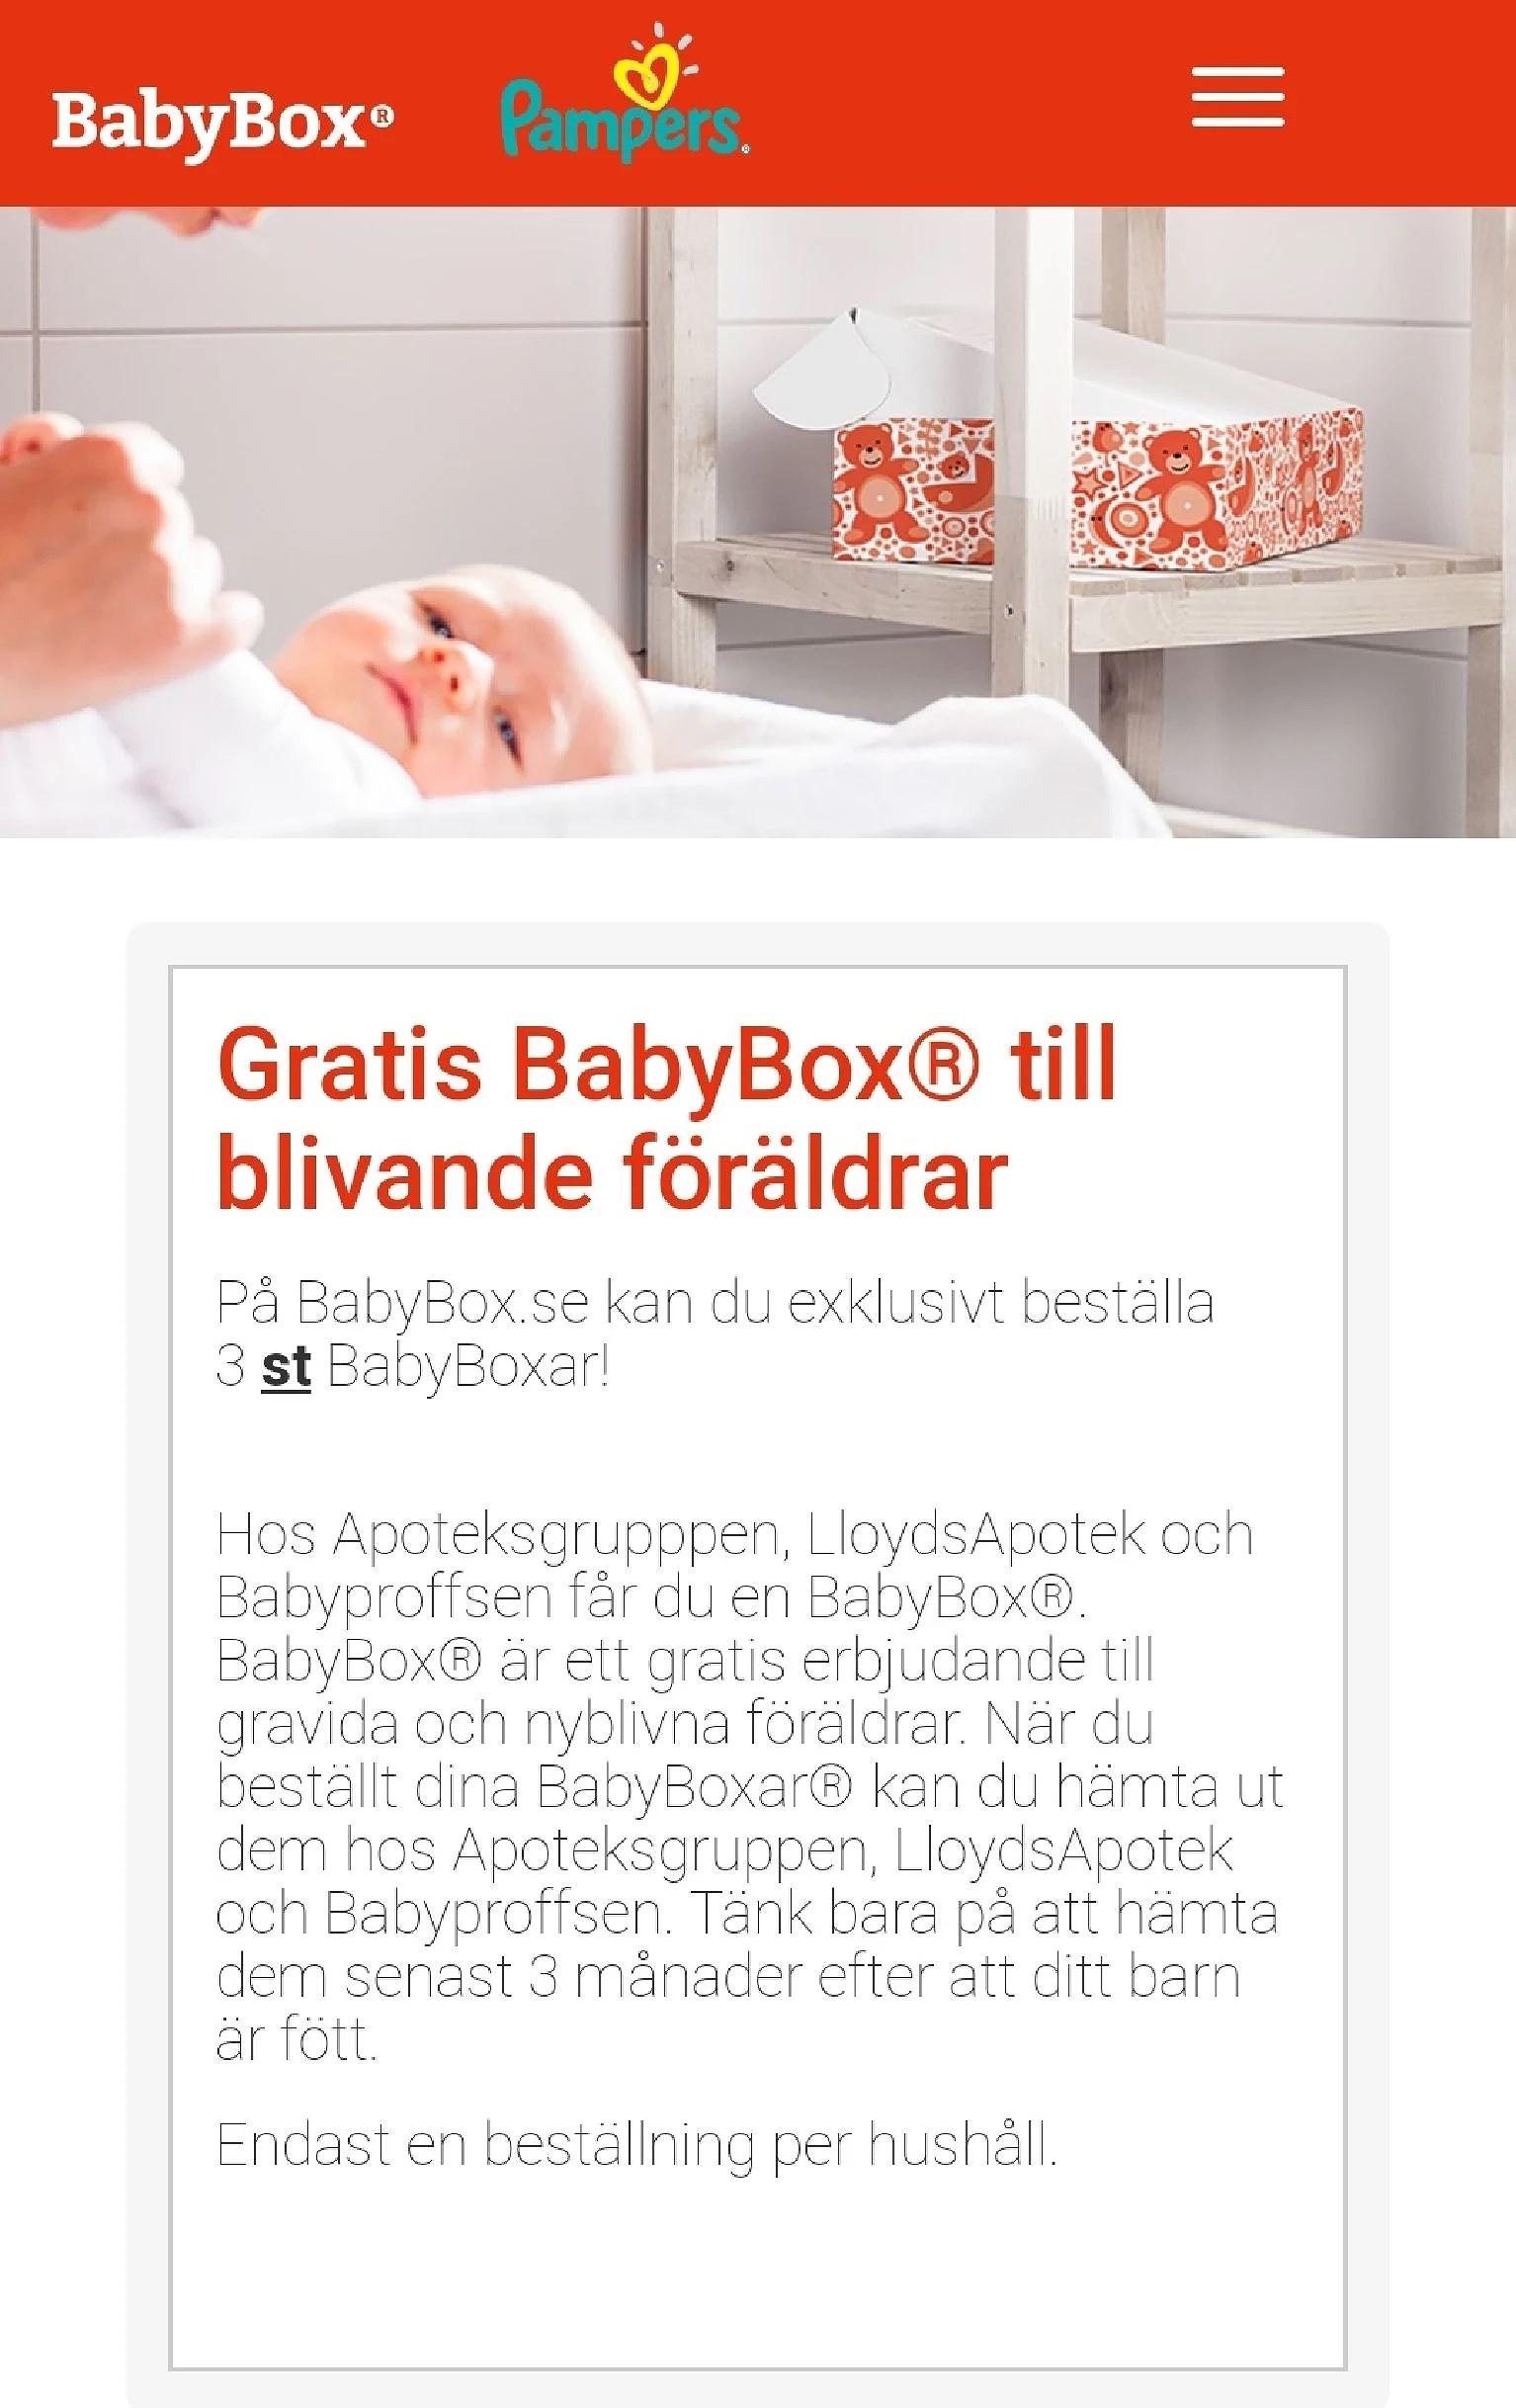 Beställ gratis Babybox